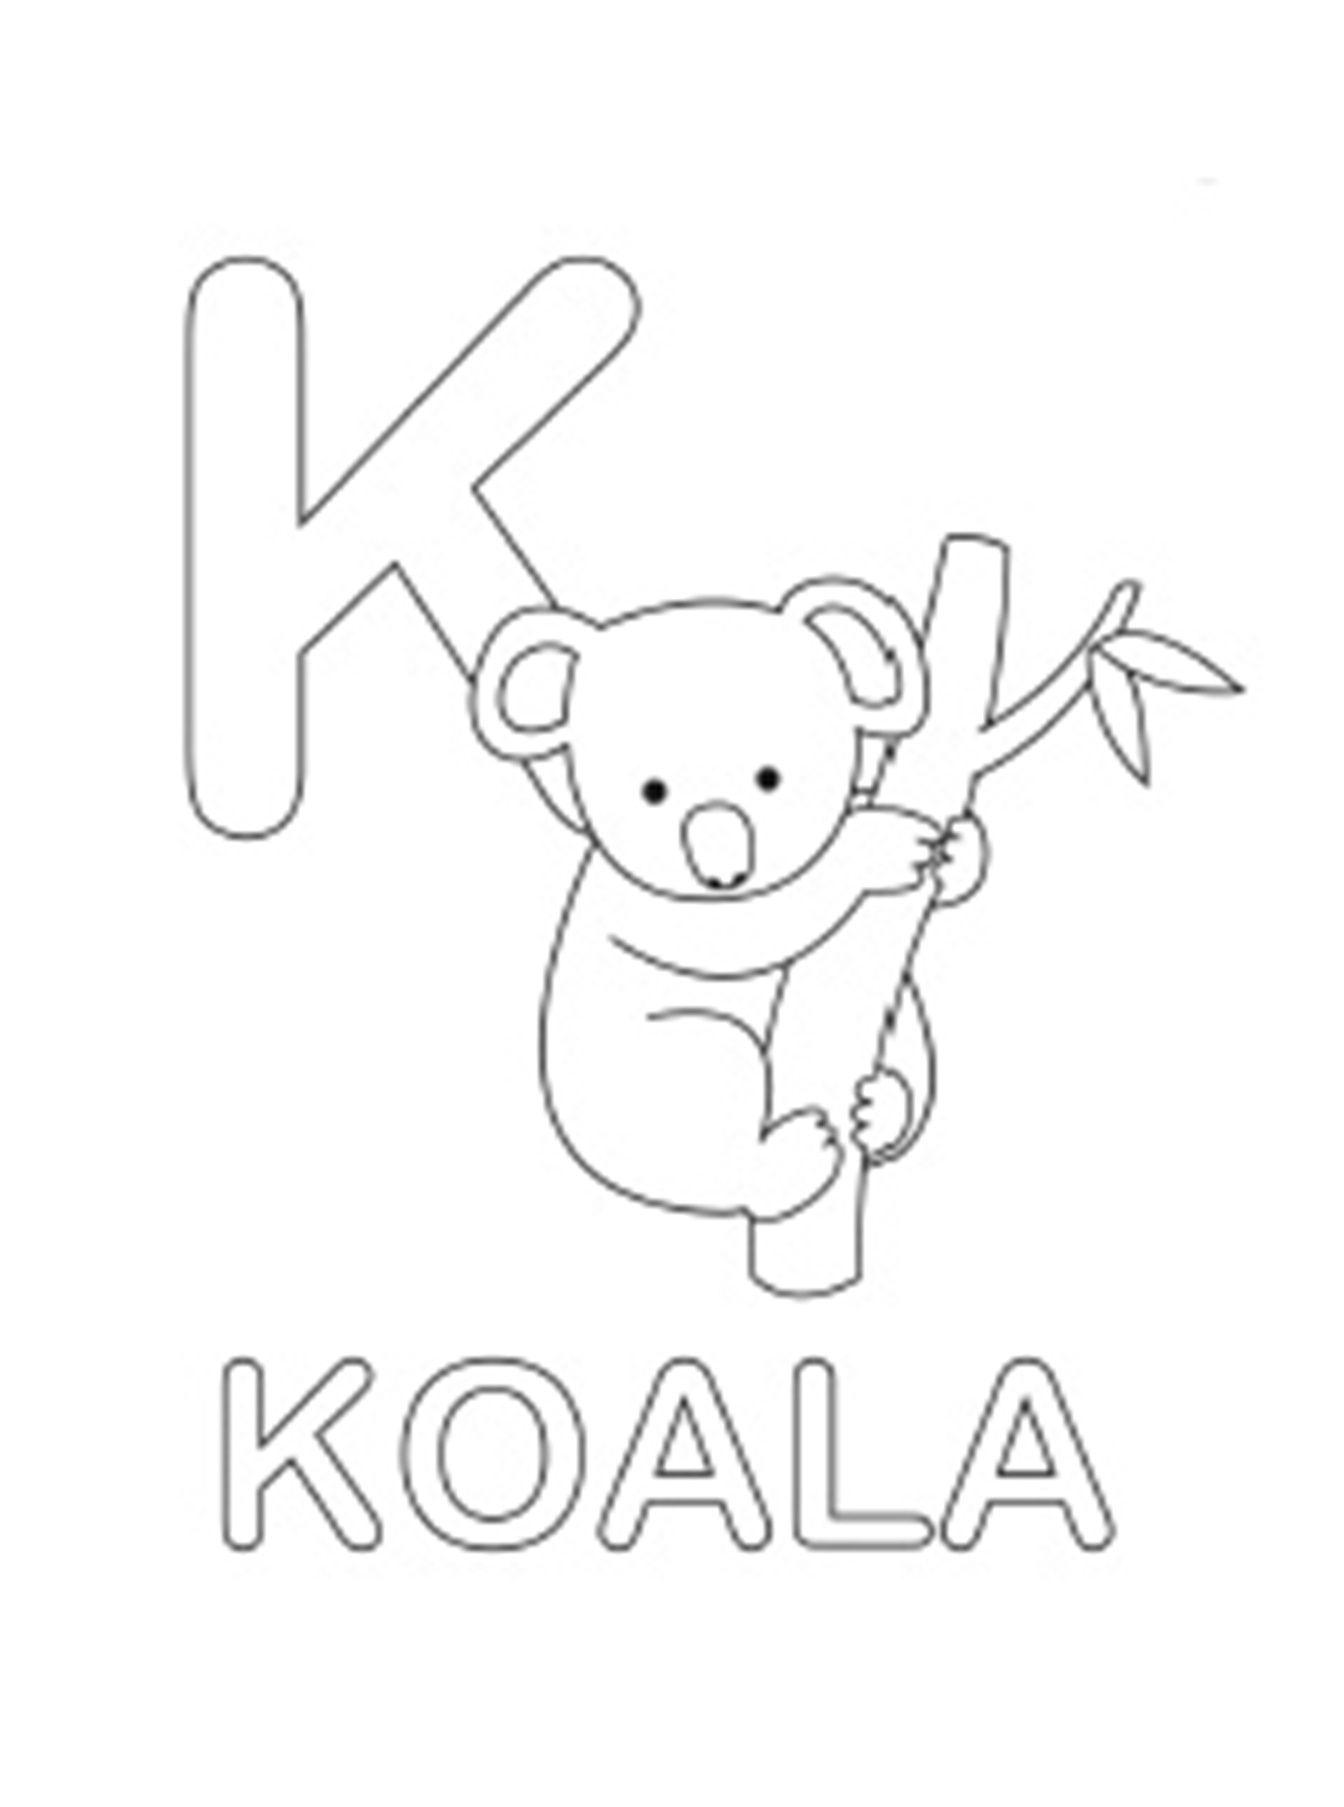 Koala Alphabet Coloring Pages Free Koala Party